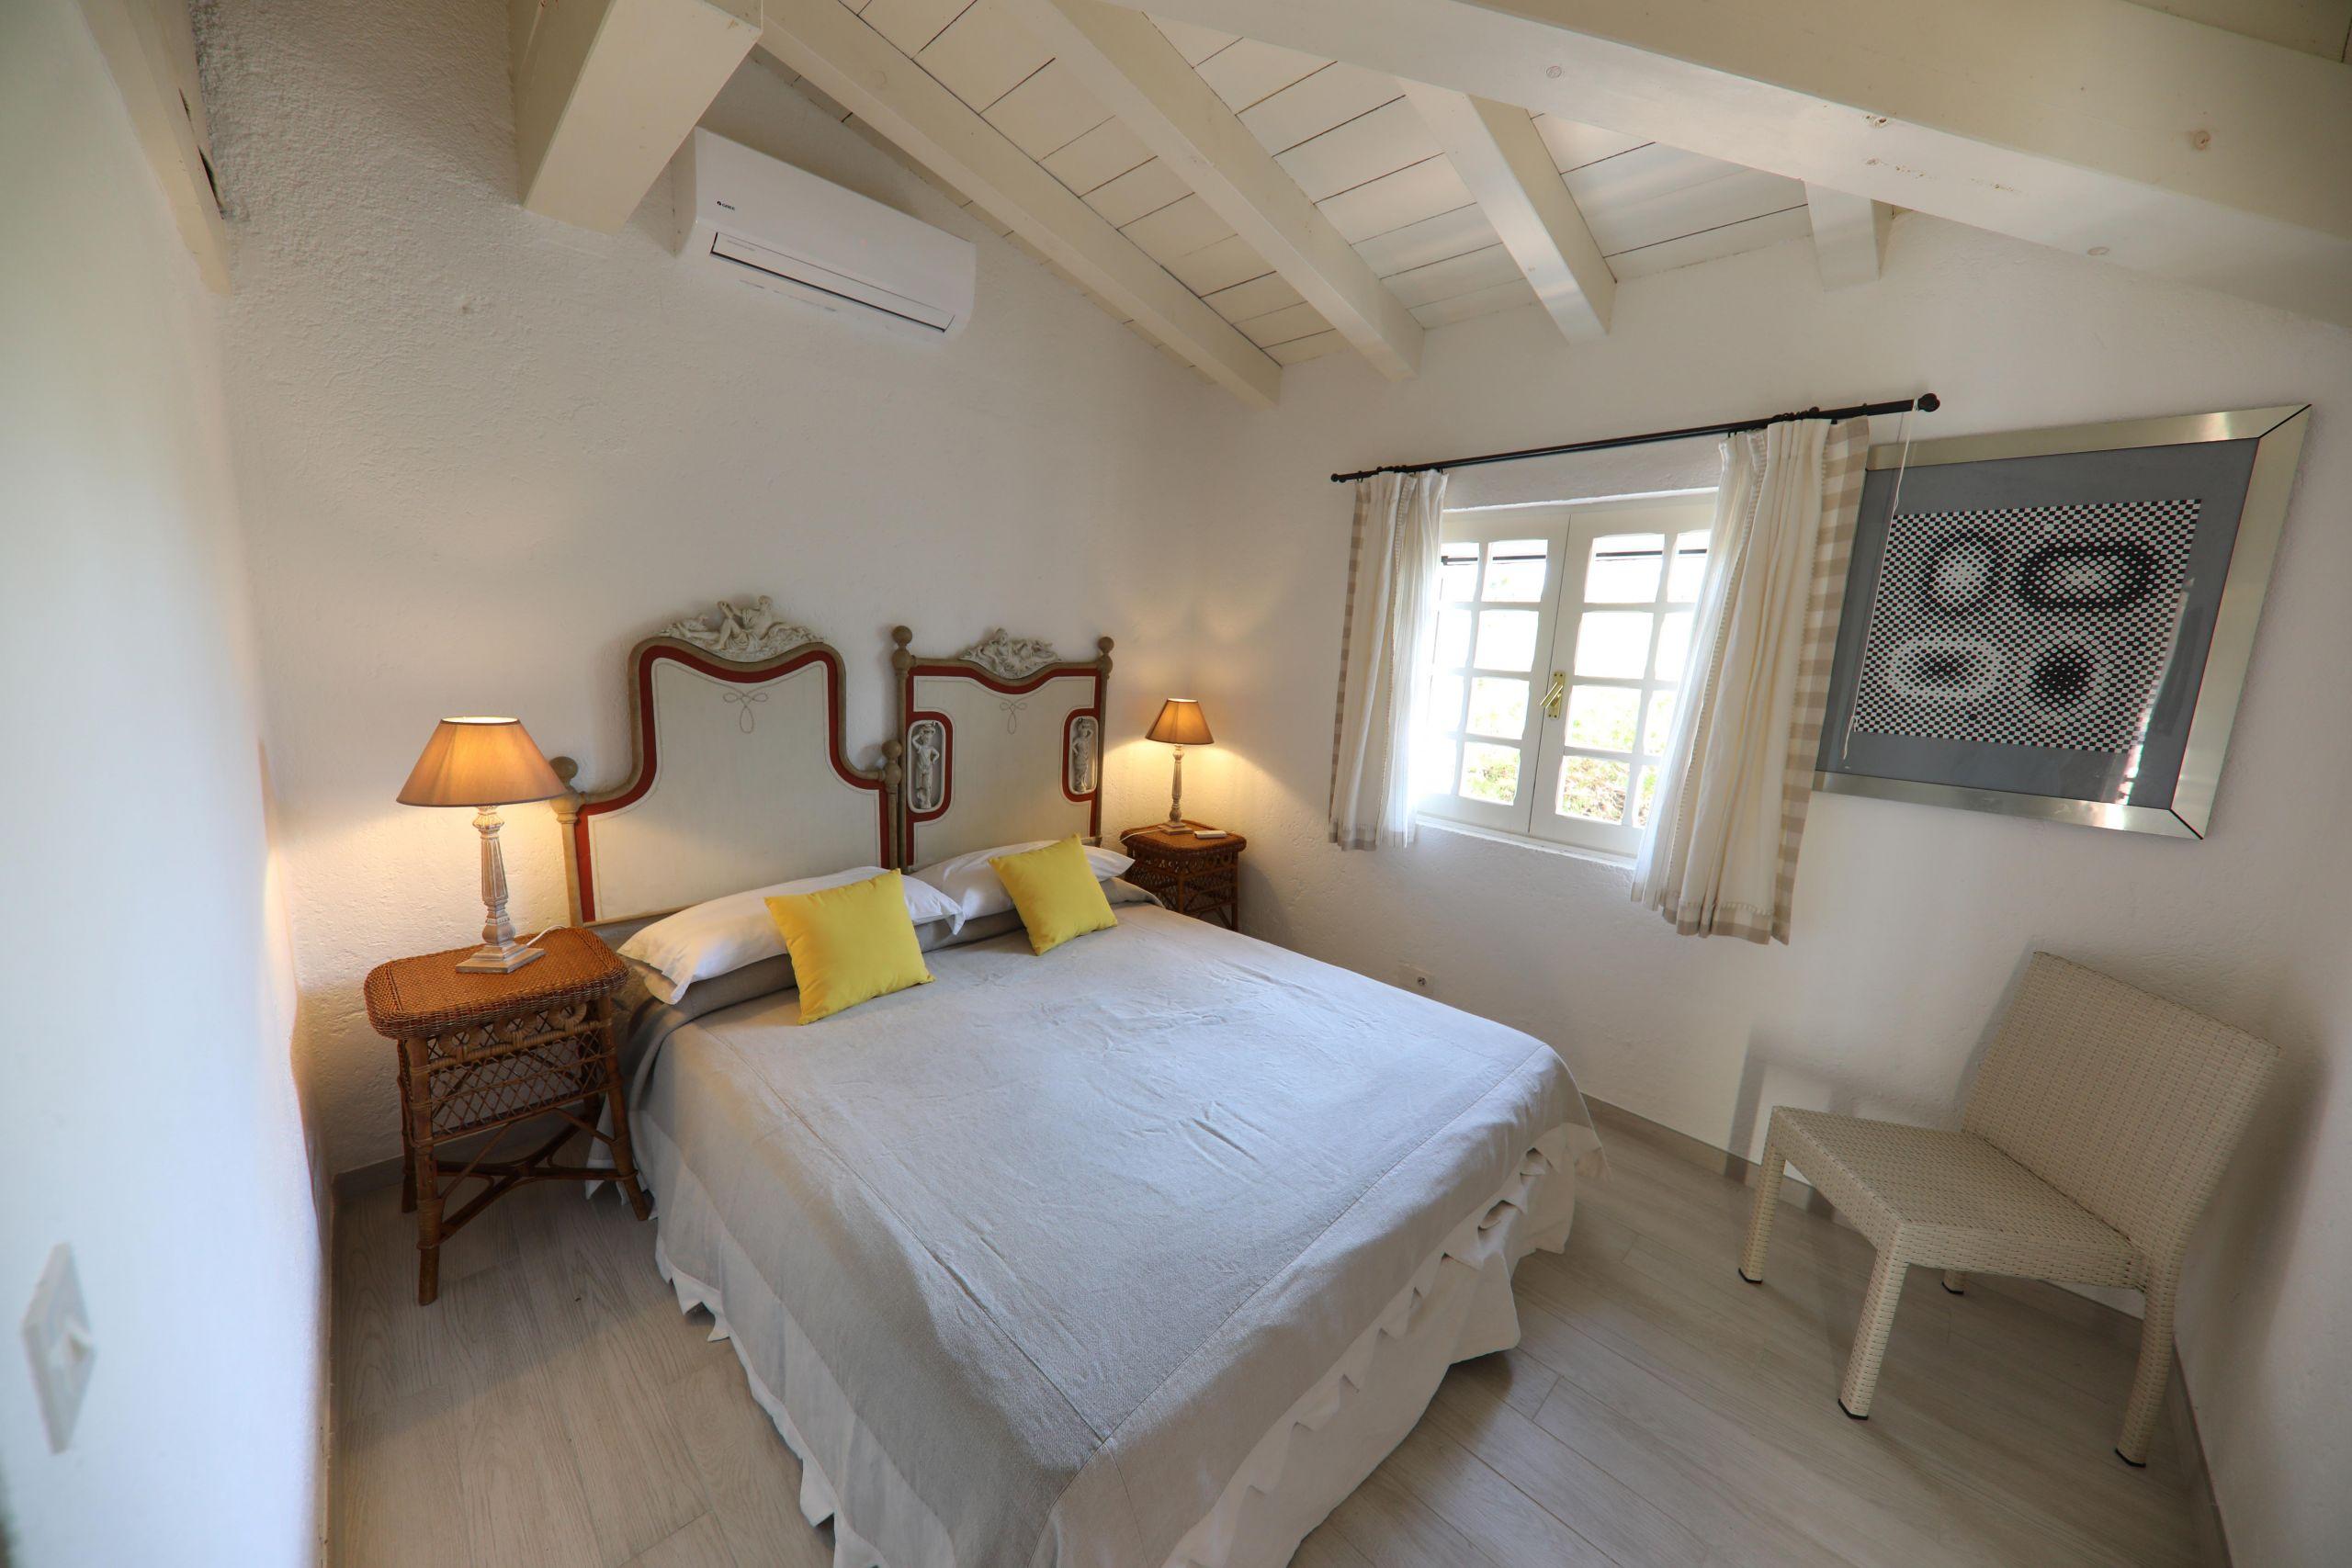 villa-zeri-bay-nord-bedroom